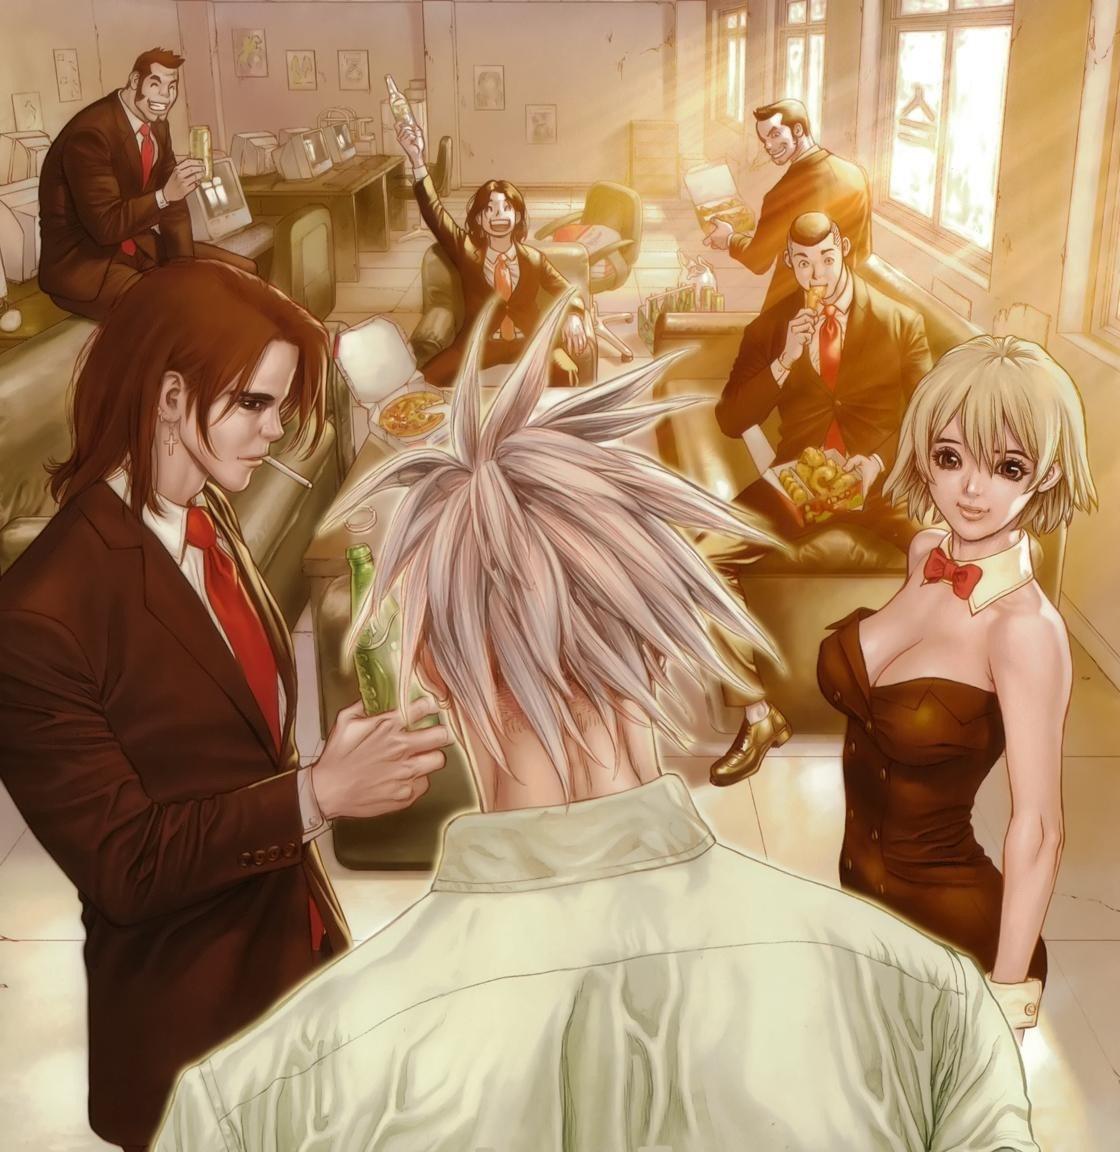 Wallpaper : anime, manga, Sun Ken Rock 1120x1152 - MrSasaTumack ...